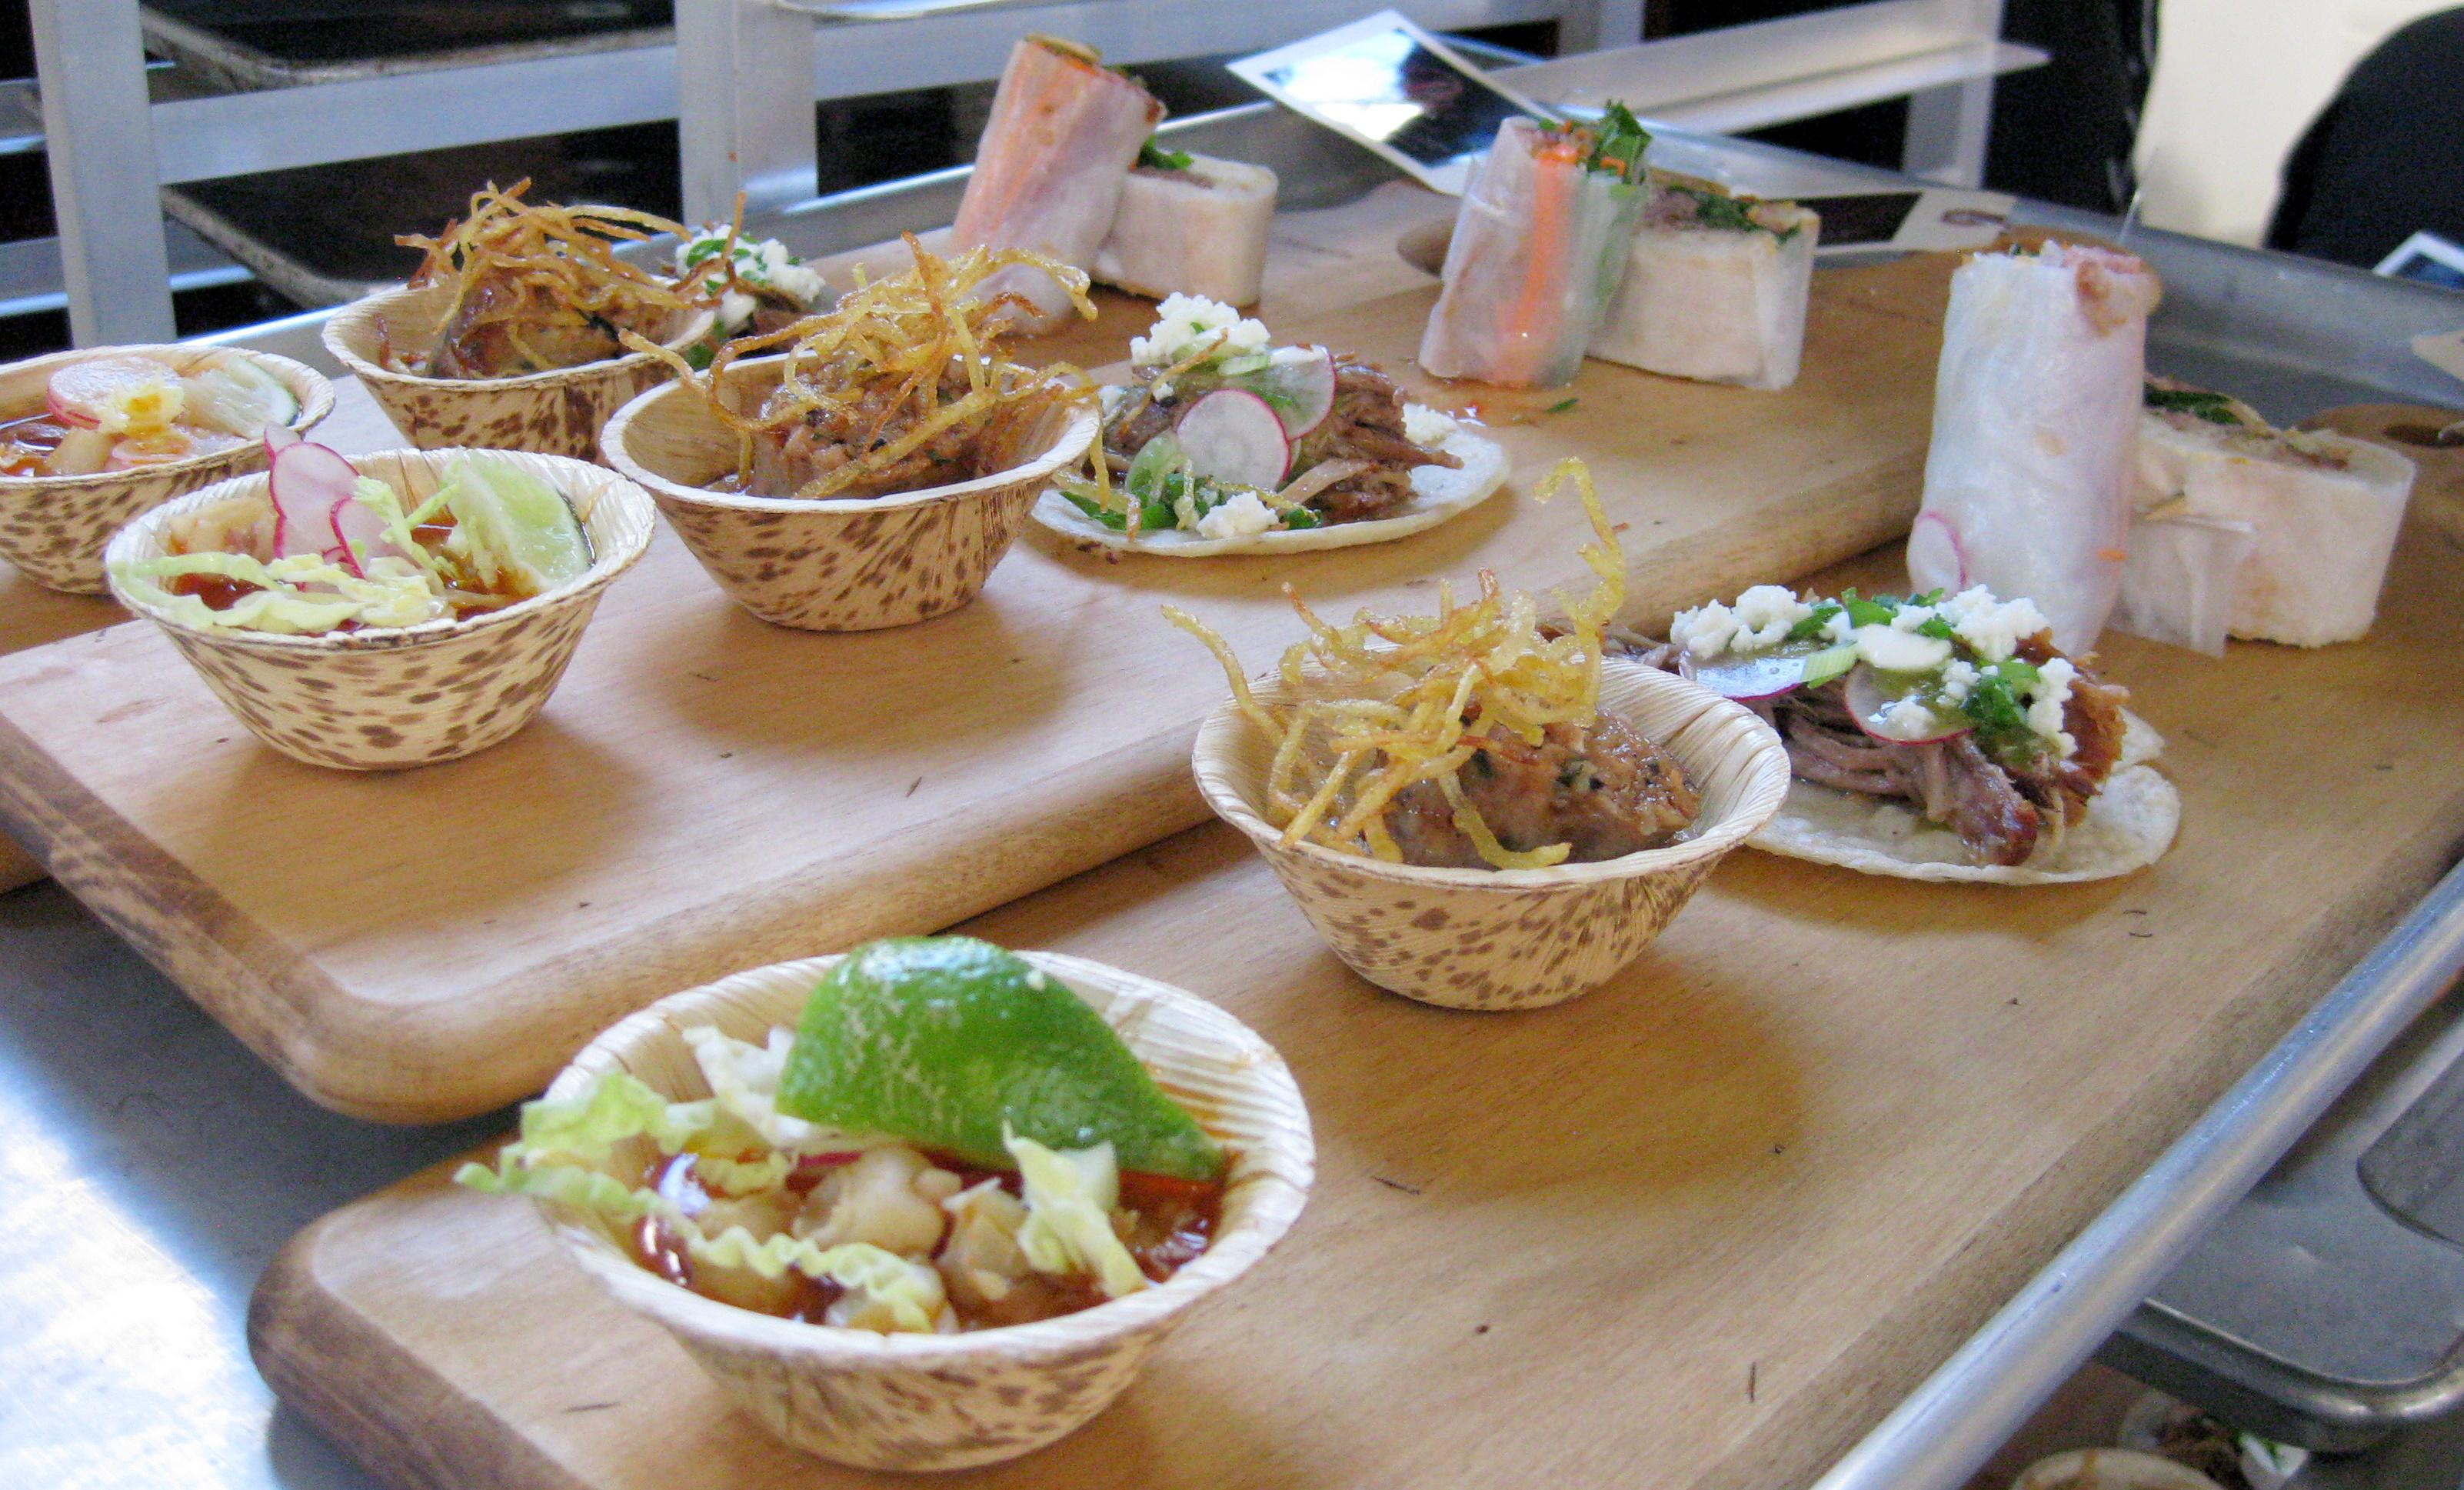 public kitchen & bar's pork dishes | gayot's blog